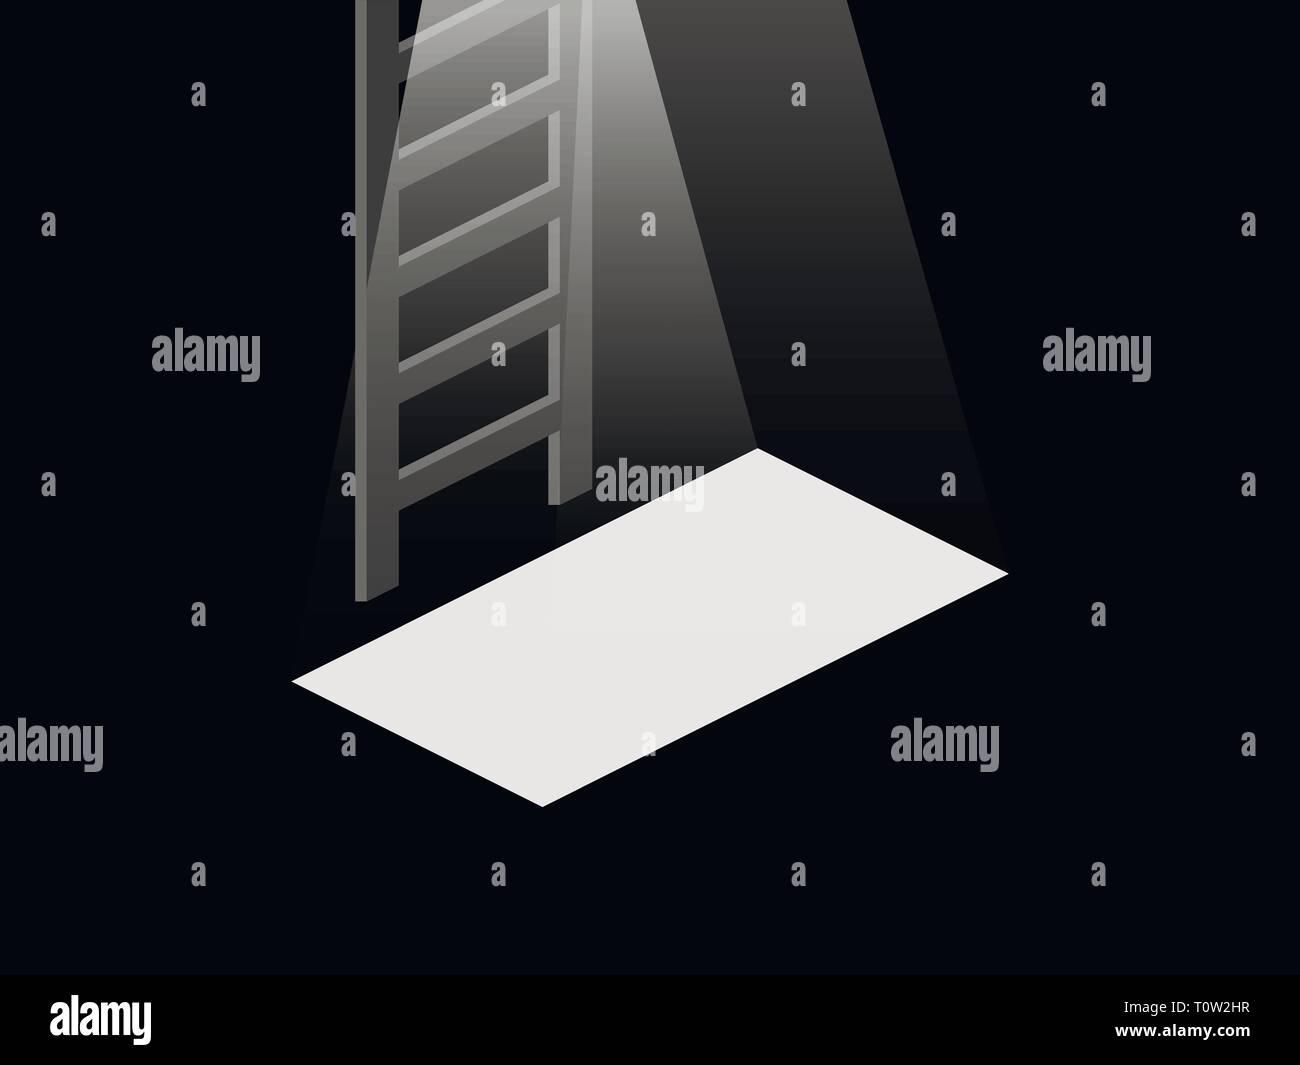 Light from the open door to the basement. Stairs from the basement to the top. Vector illustration - Stock Vector